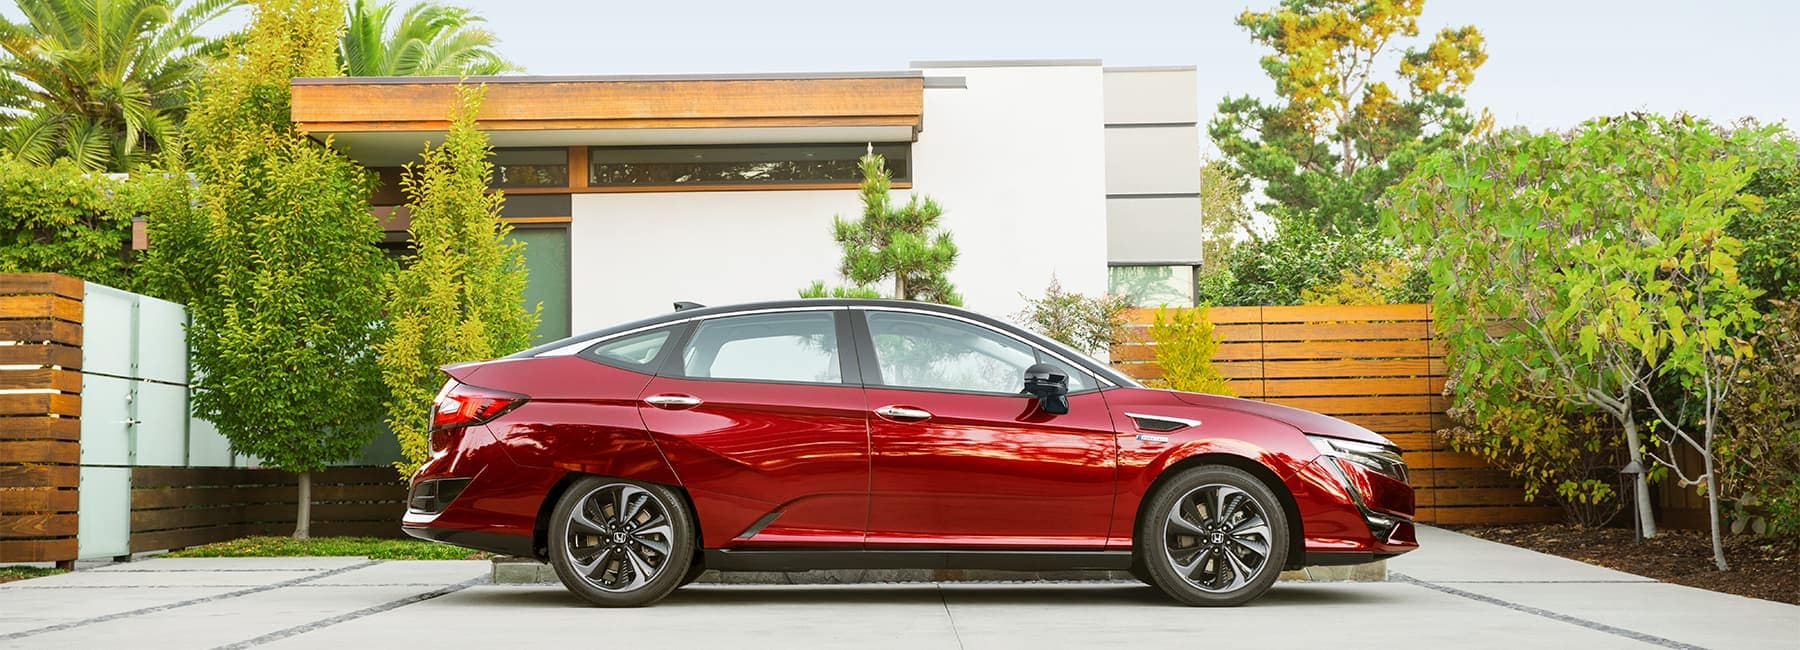 2020-Honda-Clarity-parked-side